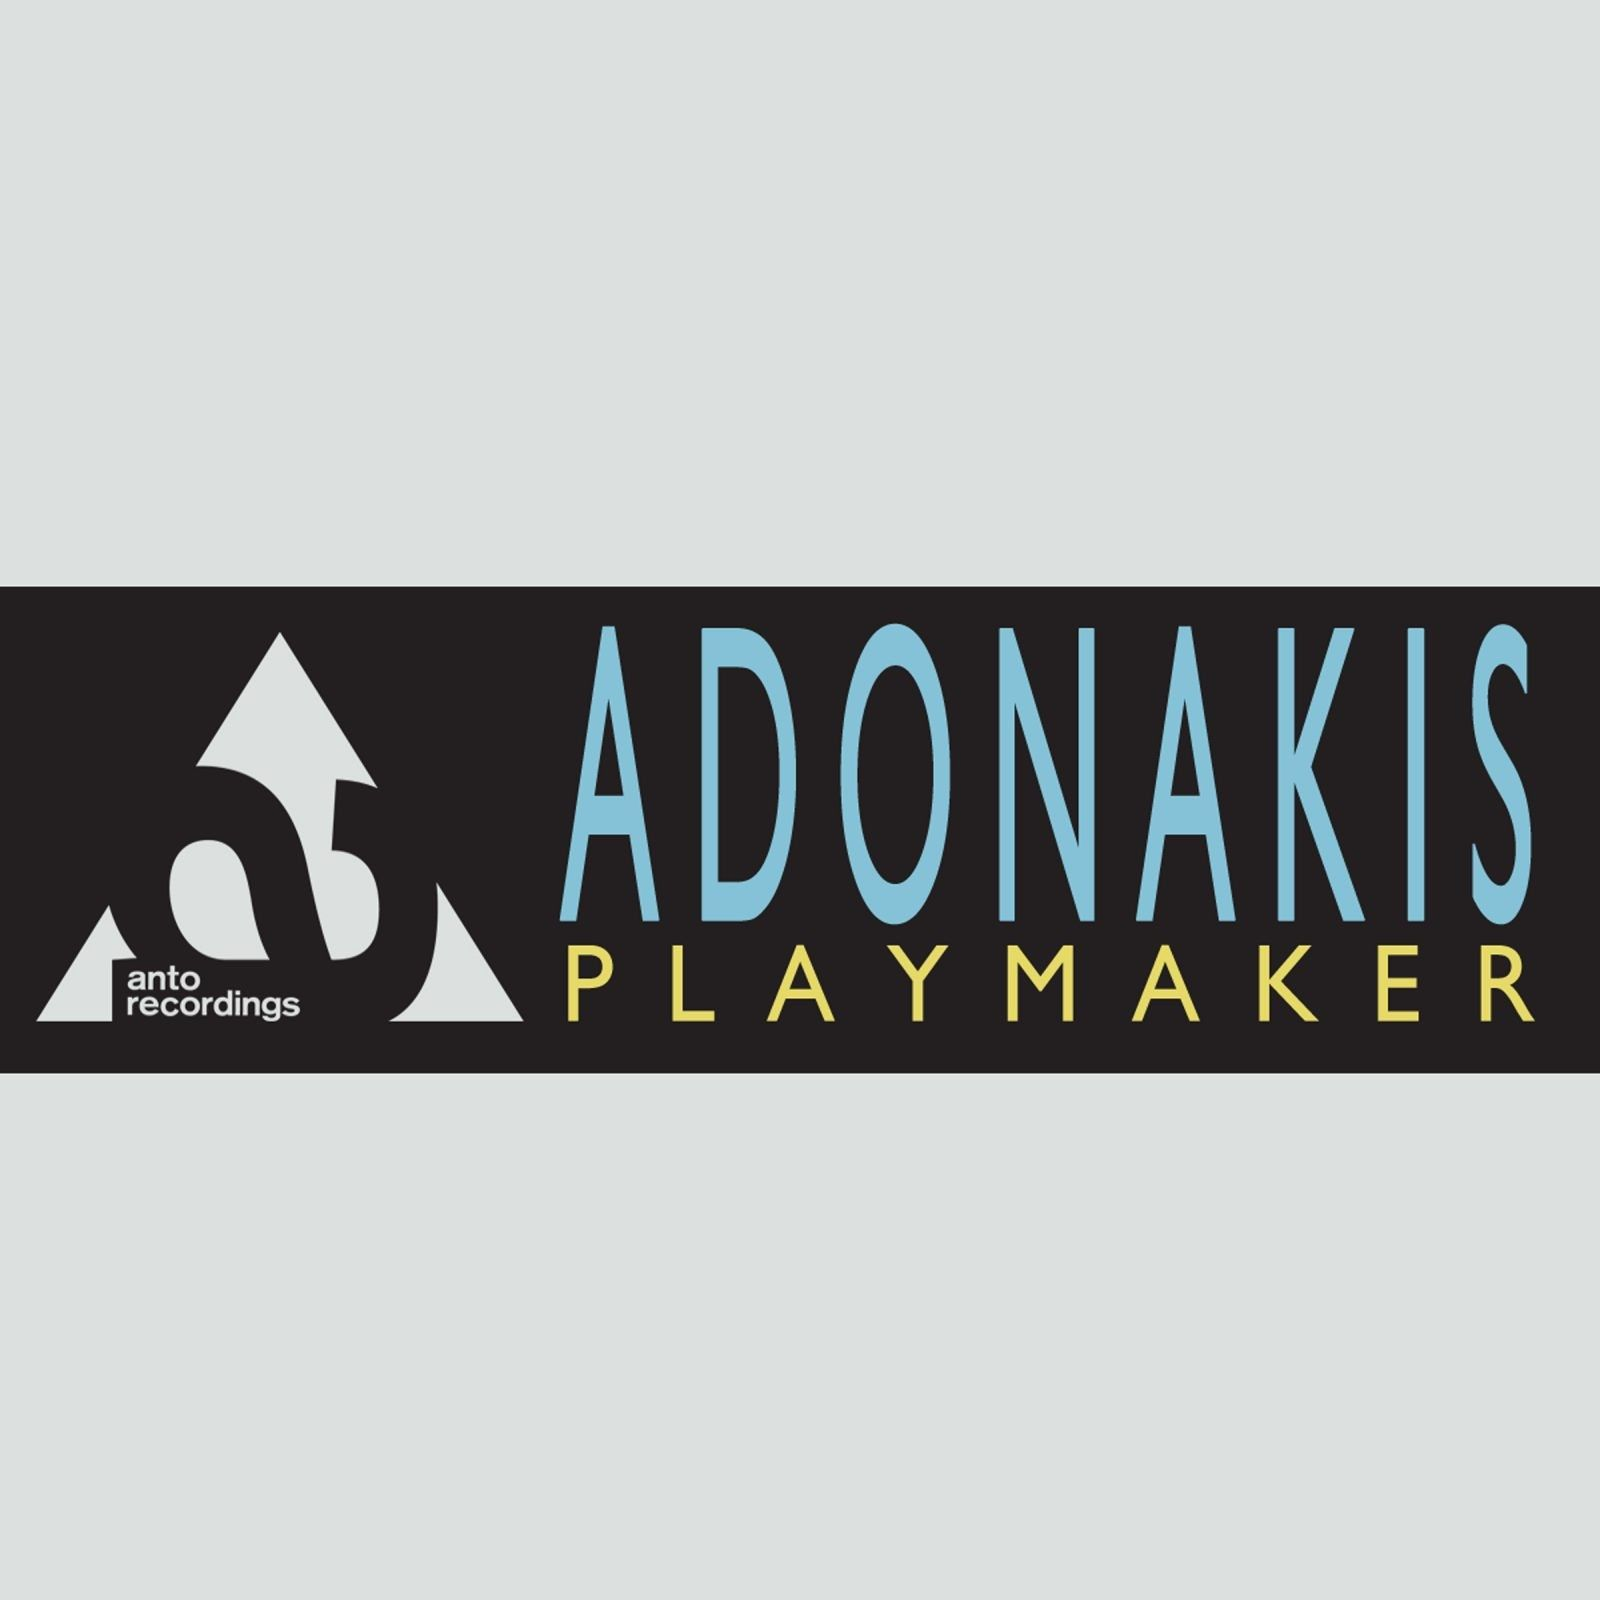 artworkplaymaker2400x2400.jpg